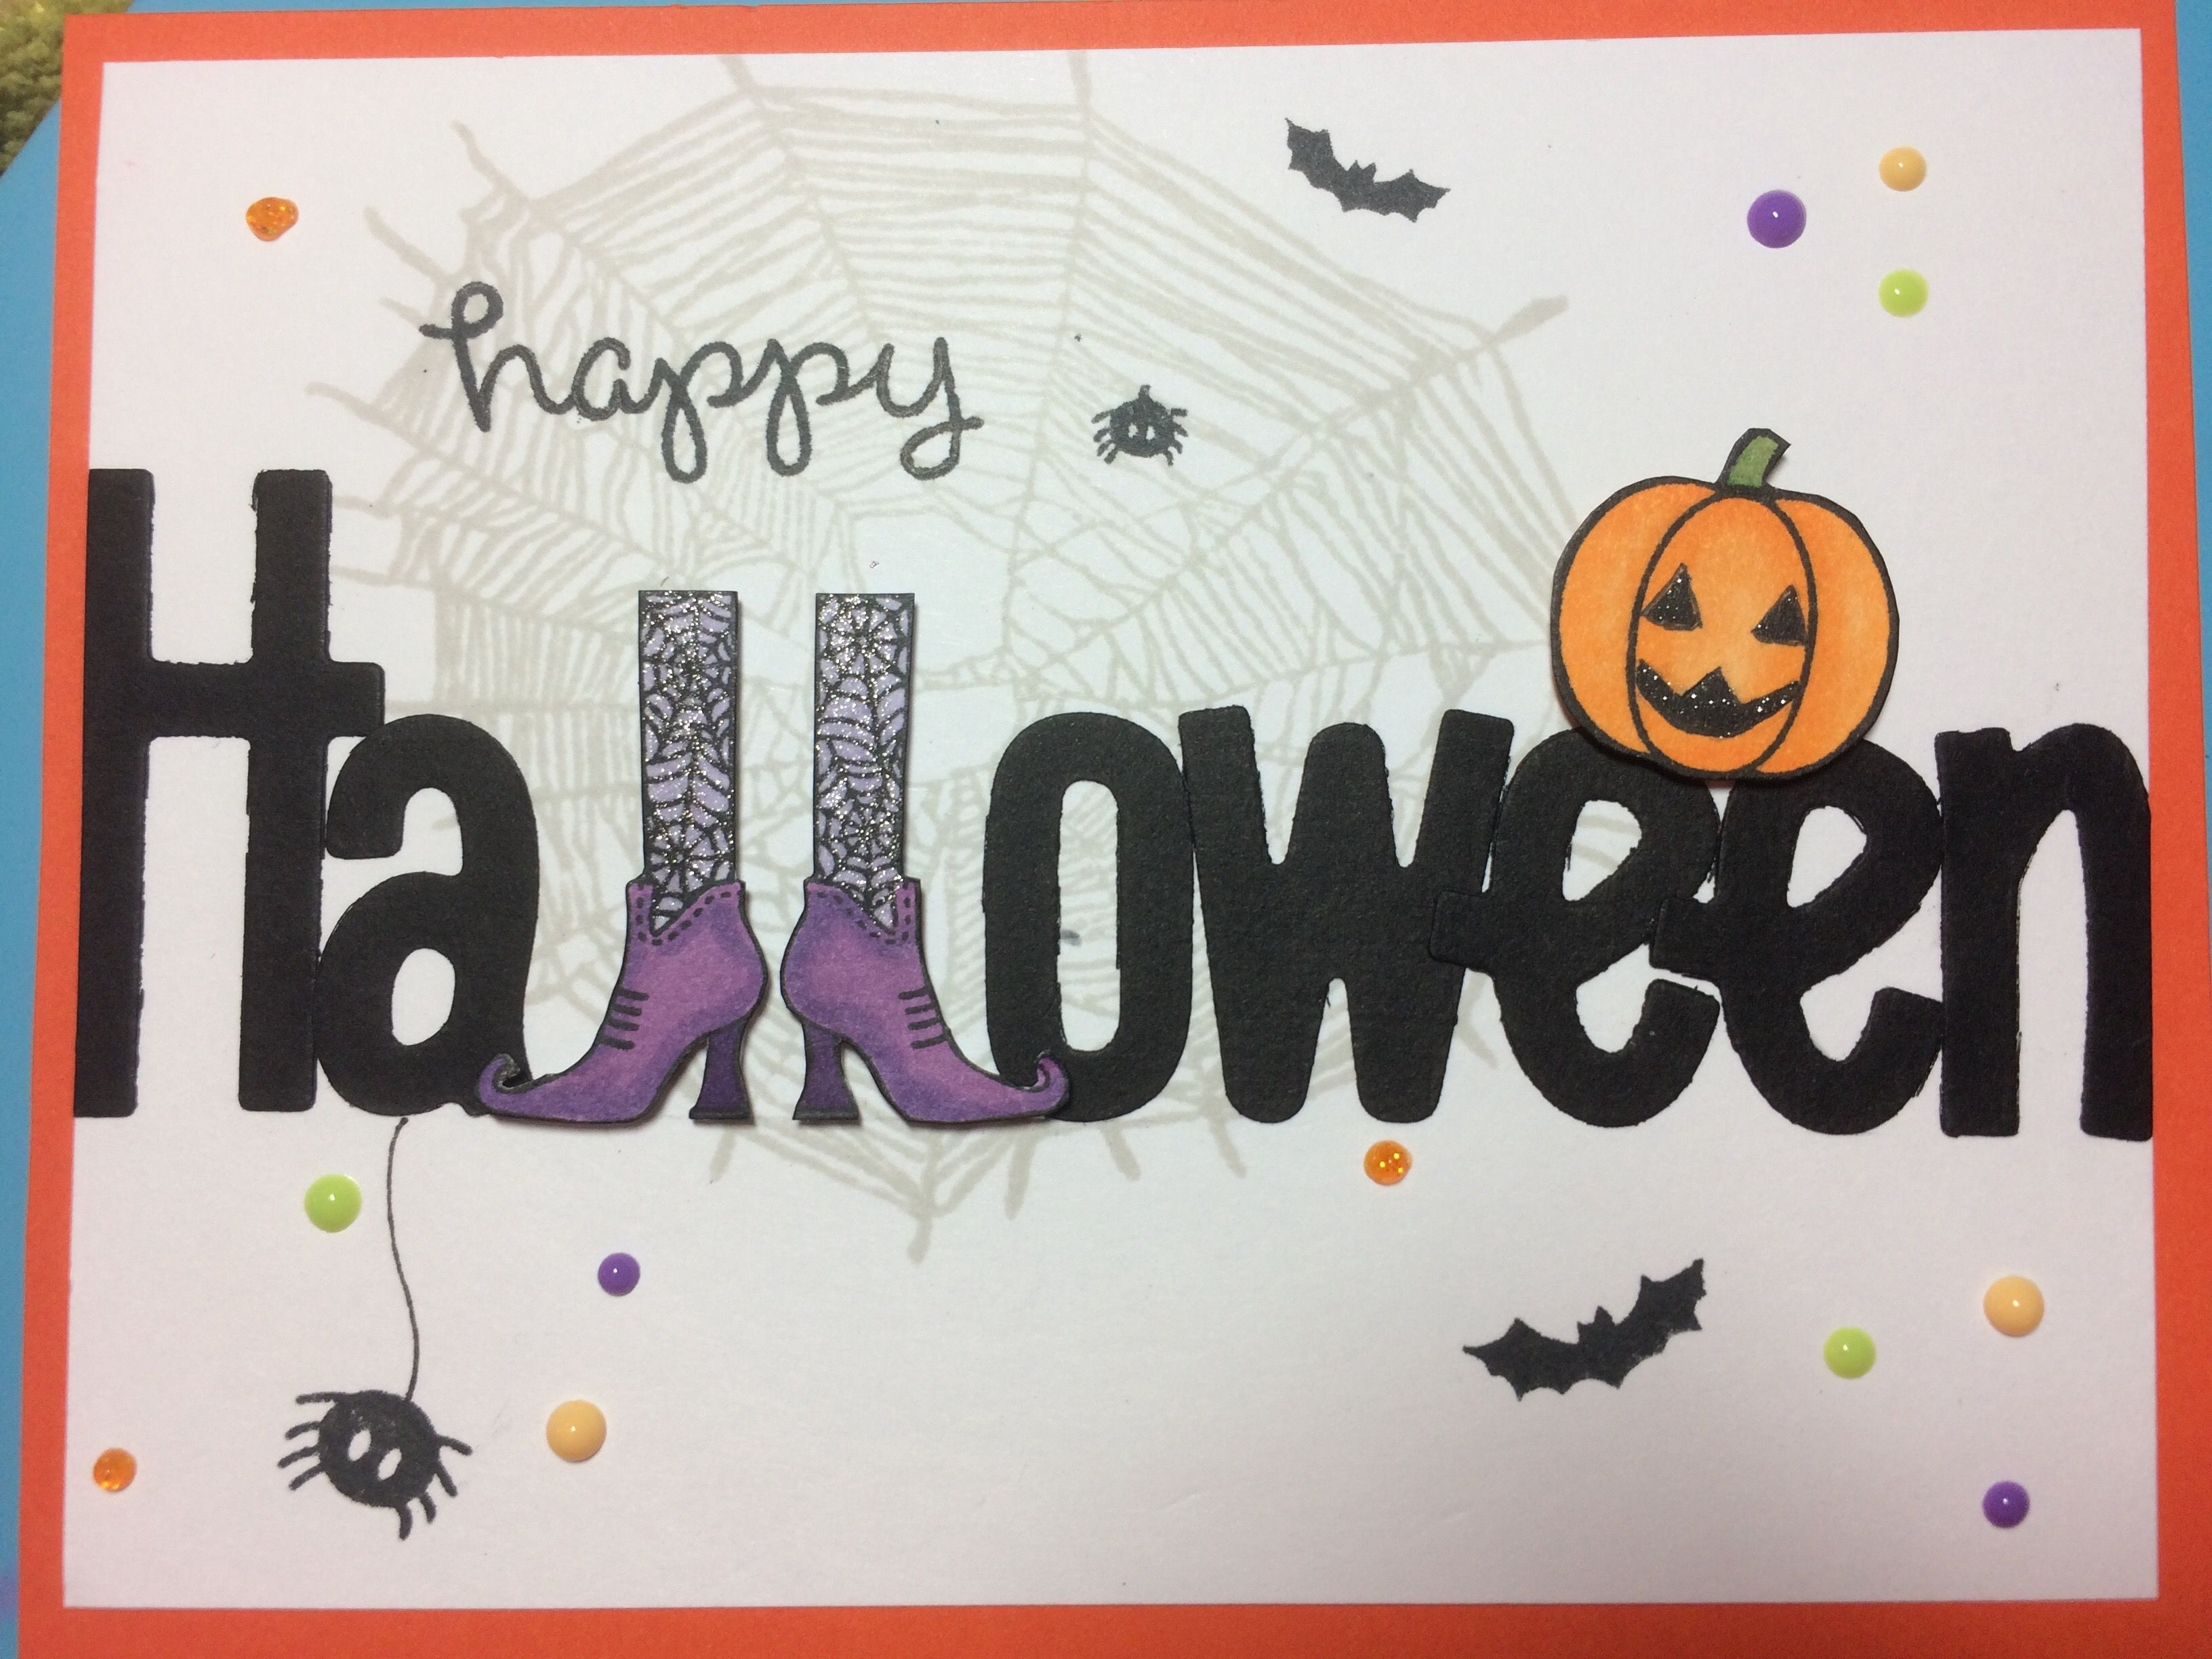 Happy Halloween Card Ideas Download Halloween Cards Vintage Halloween Cards Halloween Cards Handmade